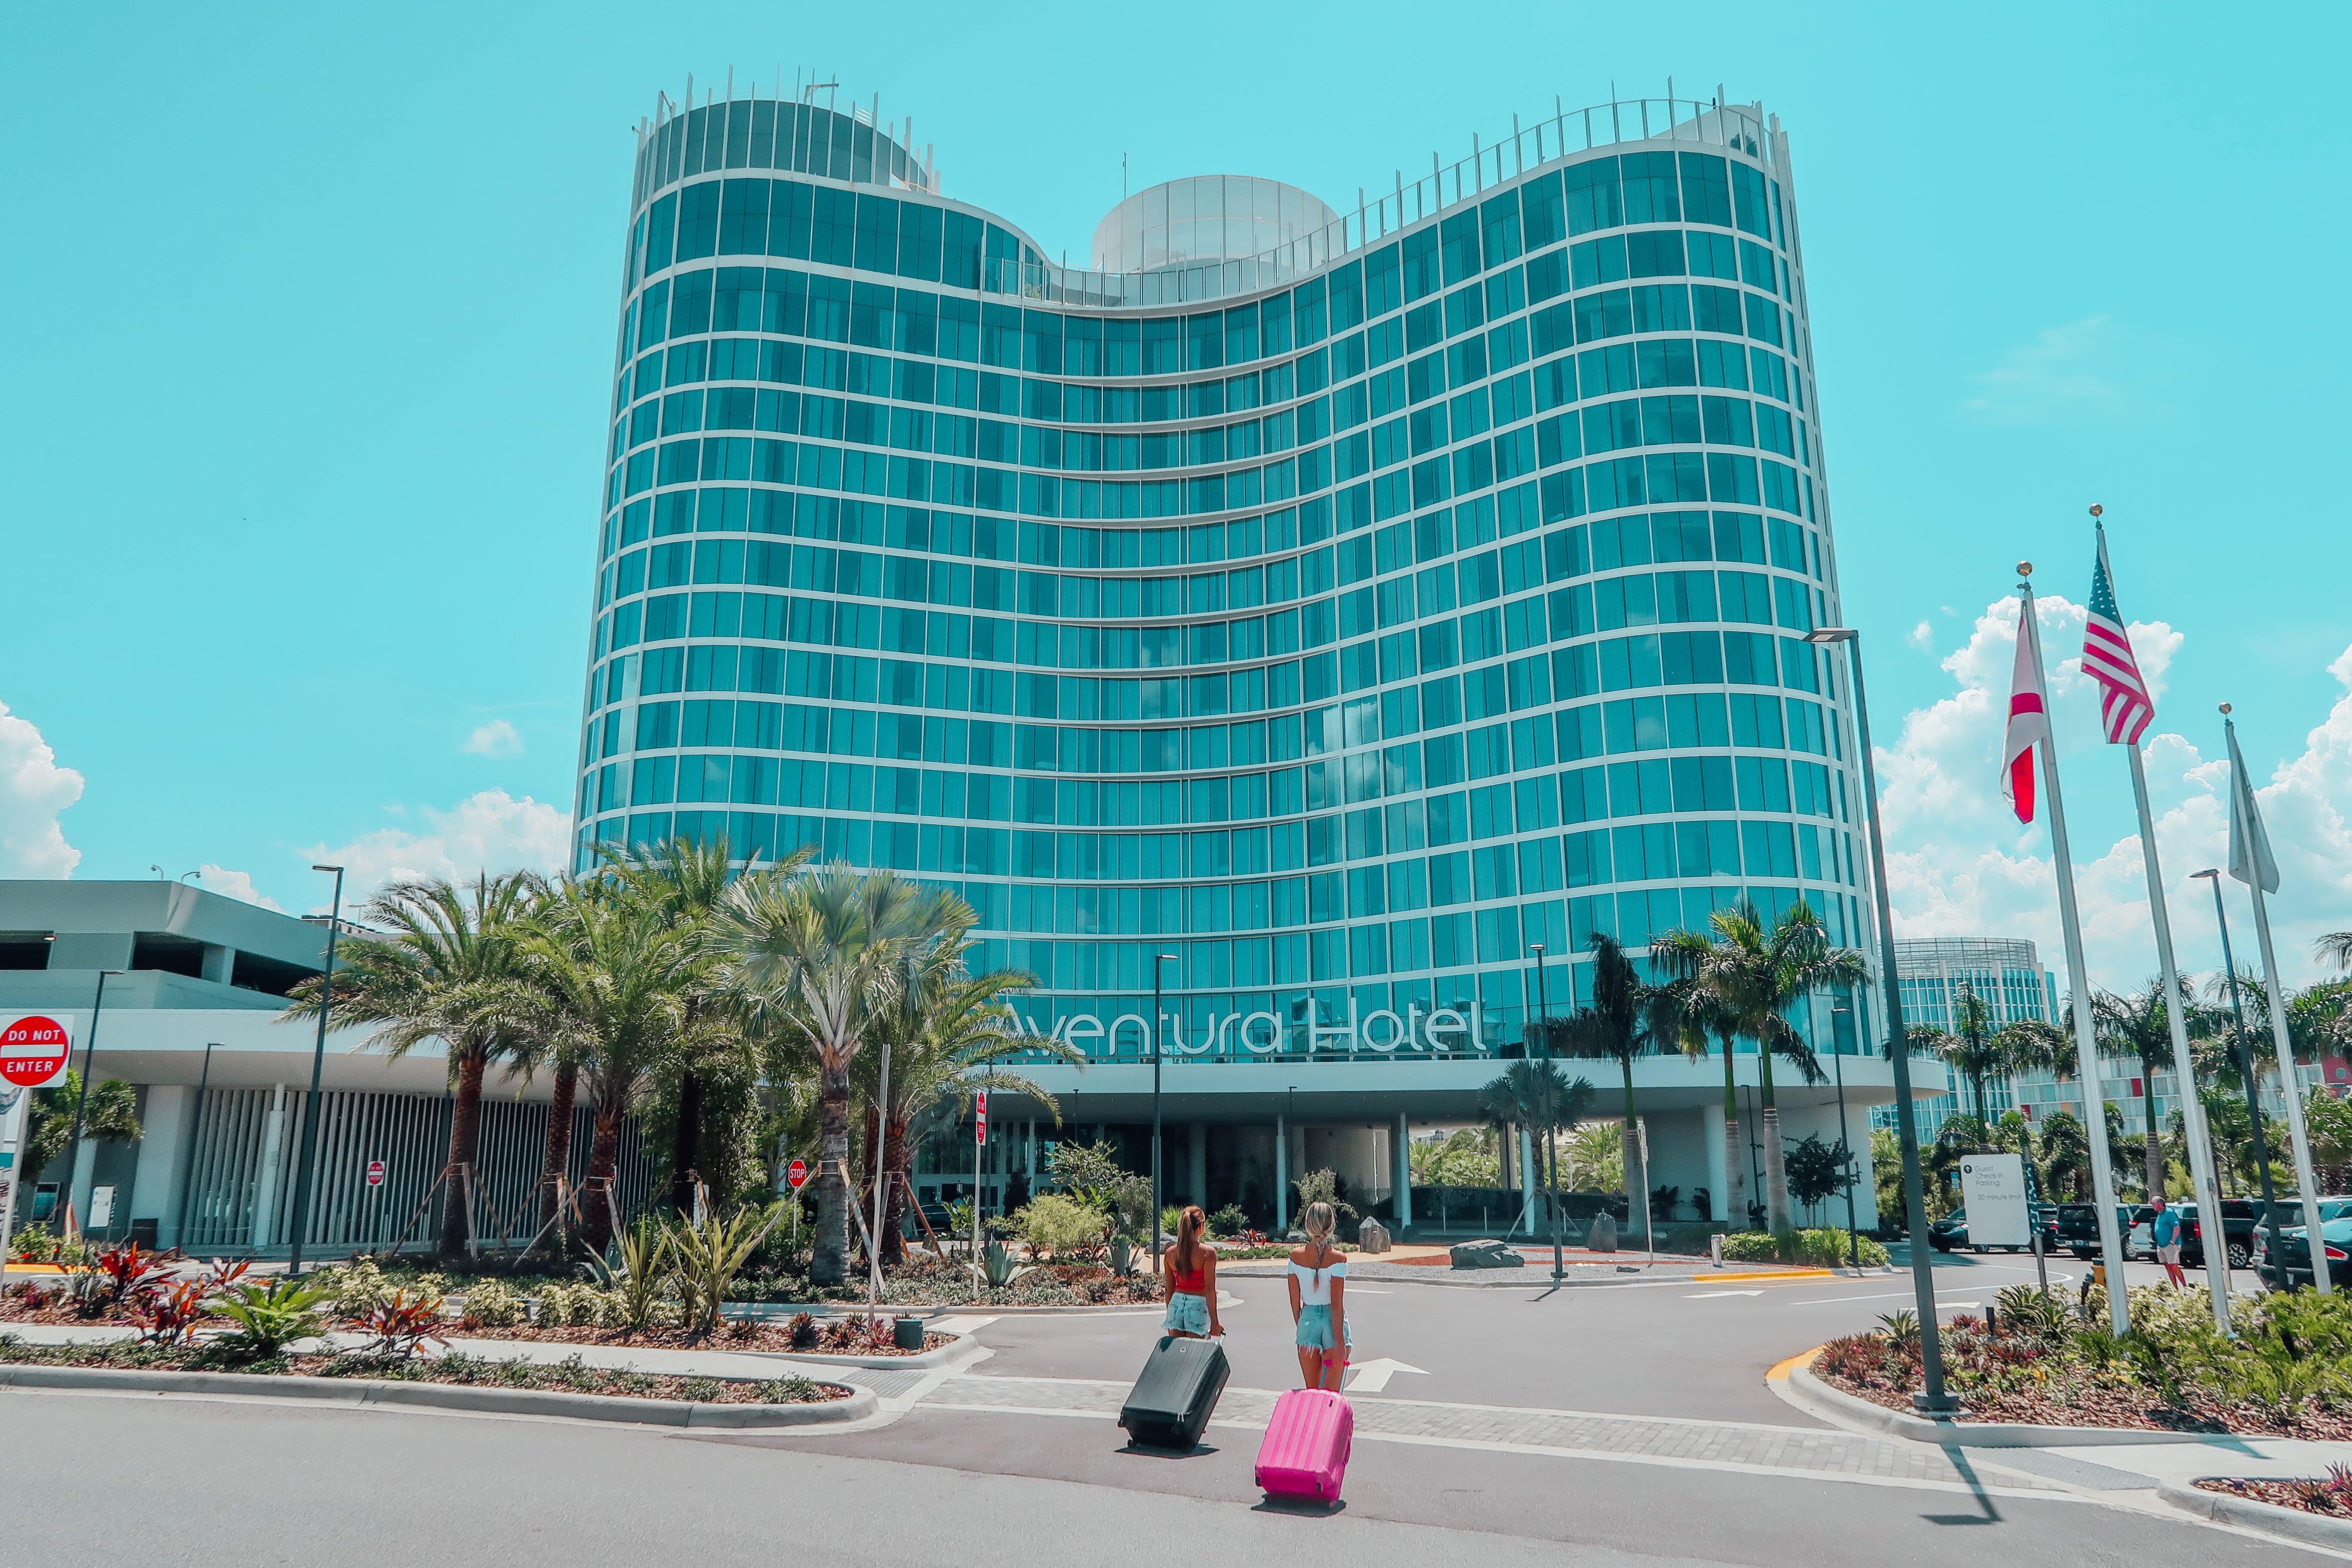 Checking into Universal's Aventura Hotel!